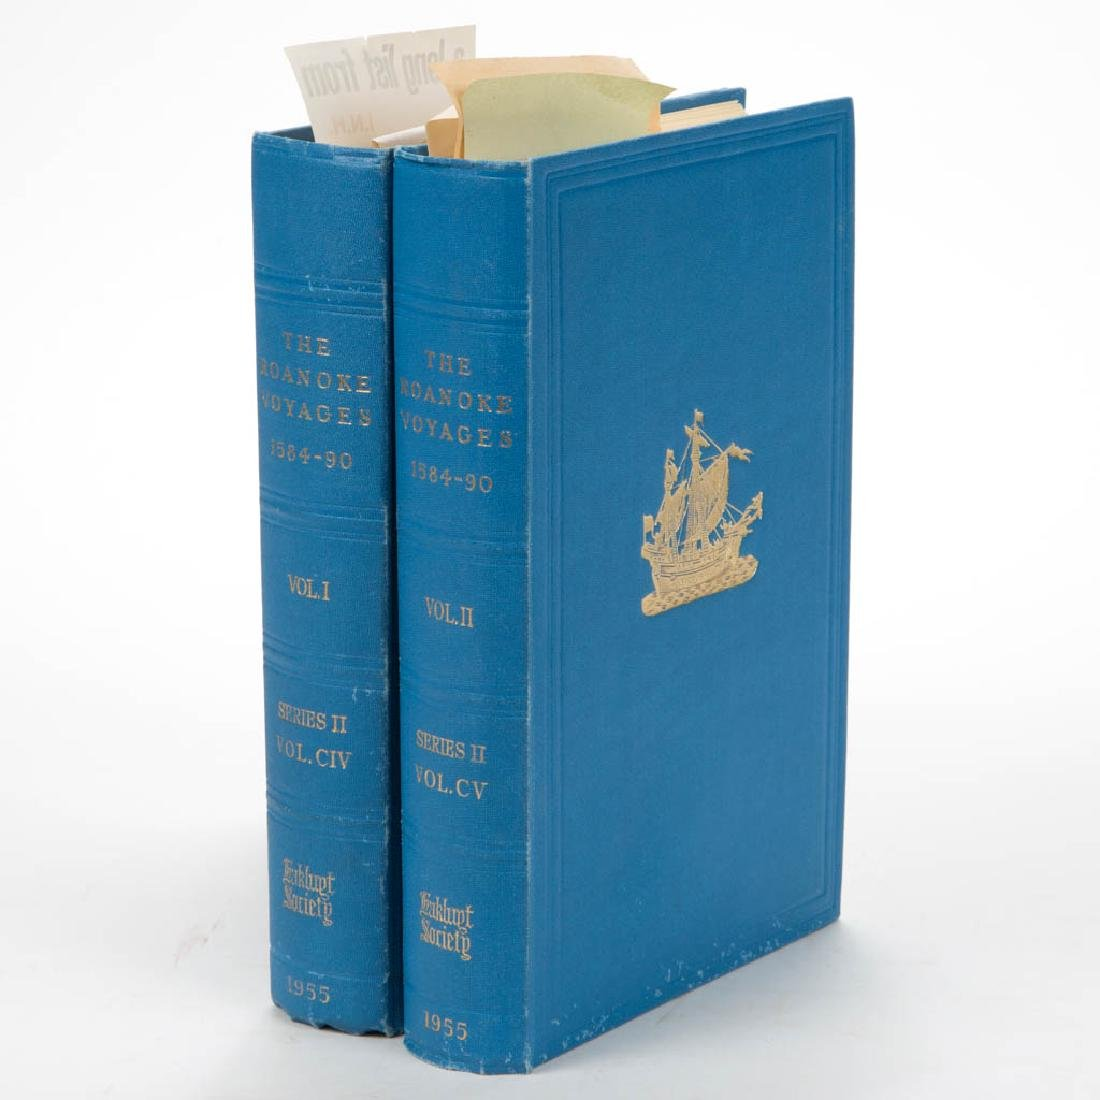 AMERICAN / BRITISH HISTORY ROANOKE VOYAGES VOLUMES, LOT